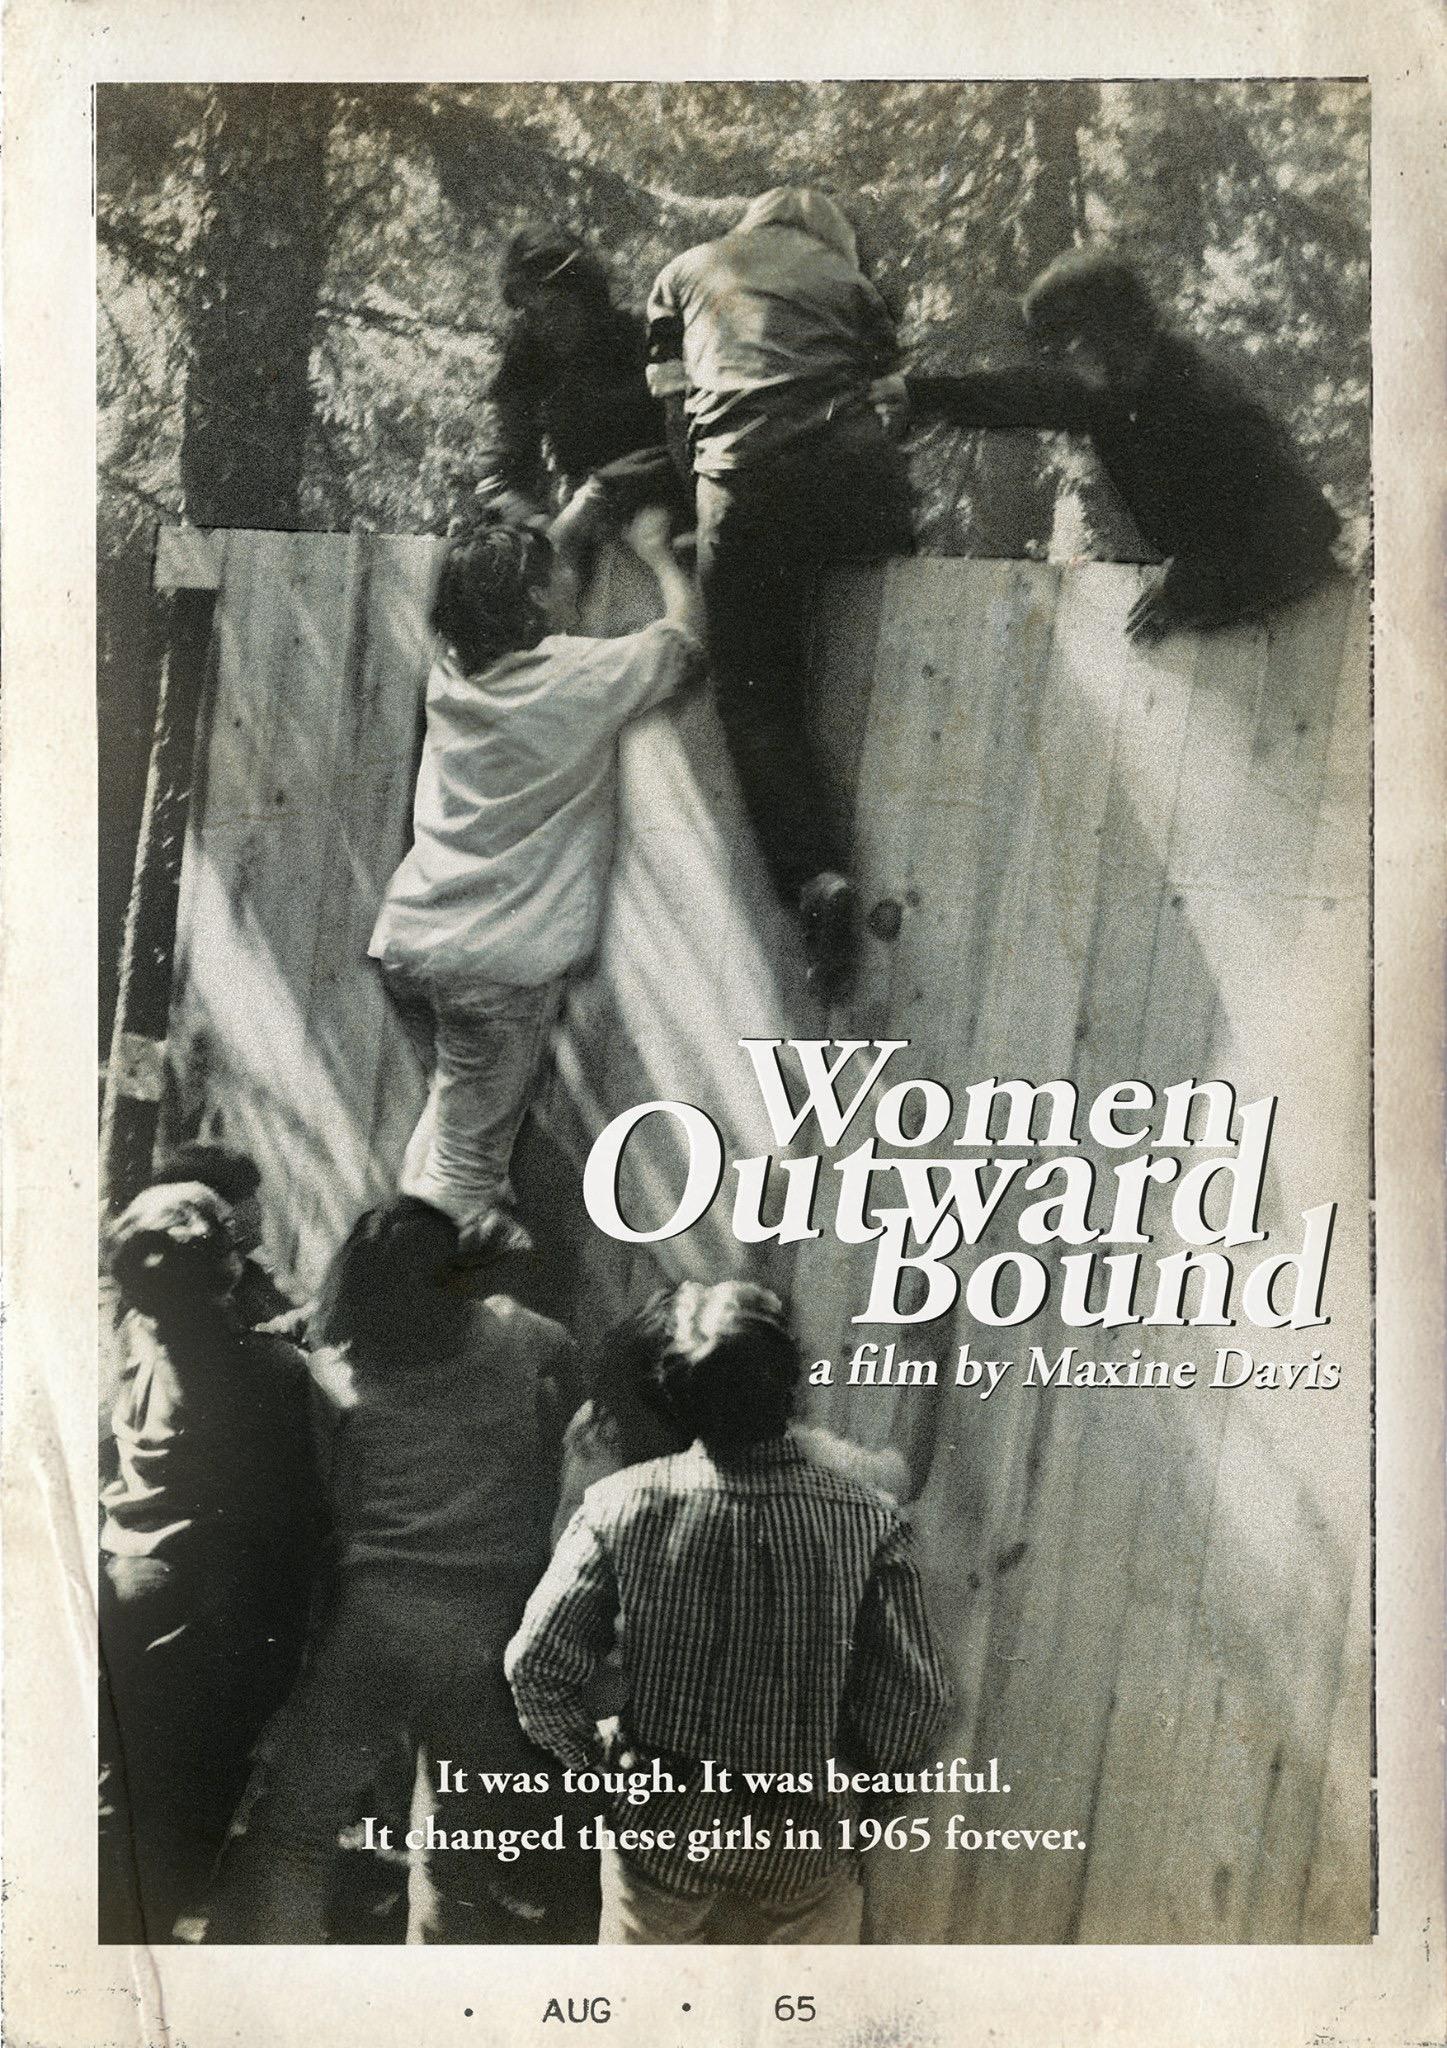 Women-Outward-Bound-Cover.jpg